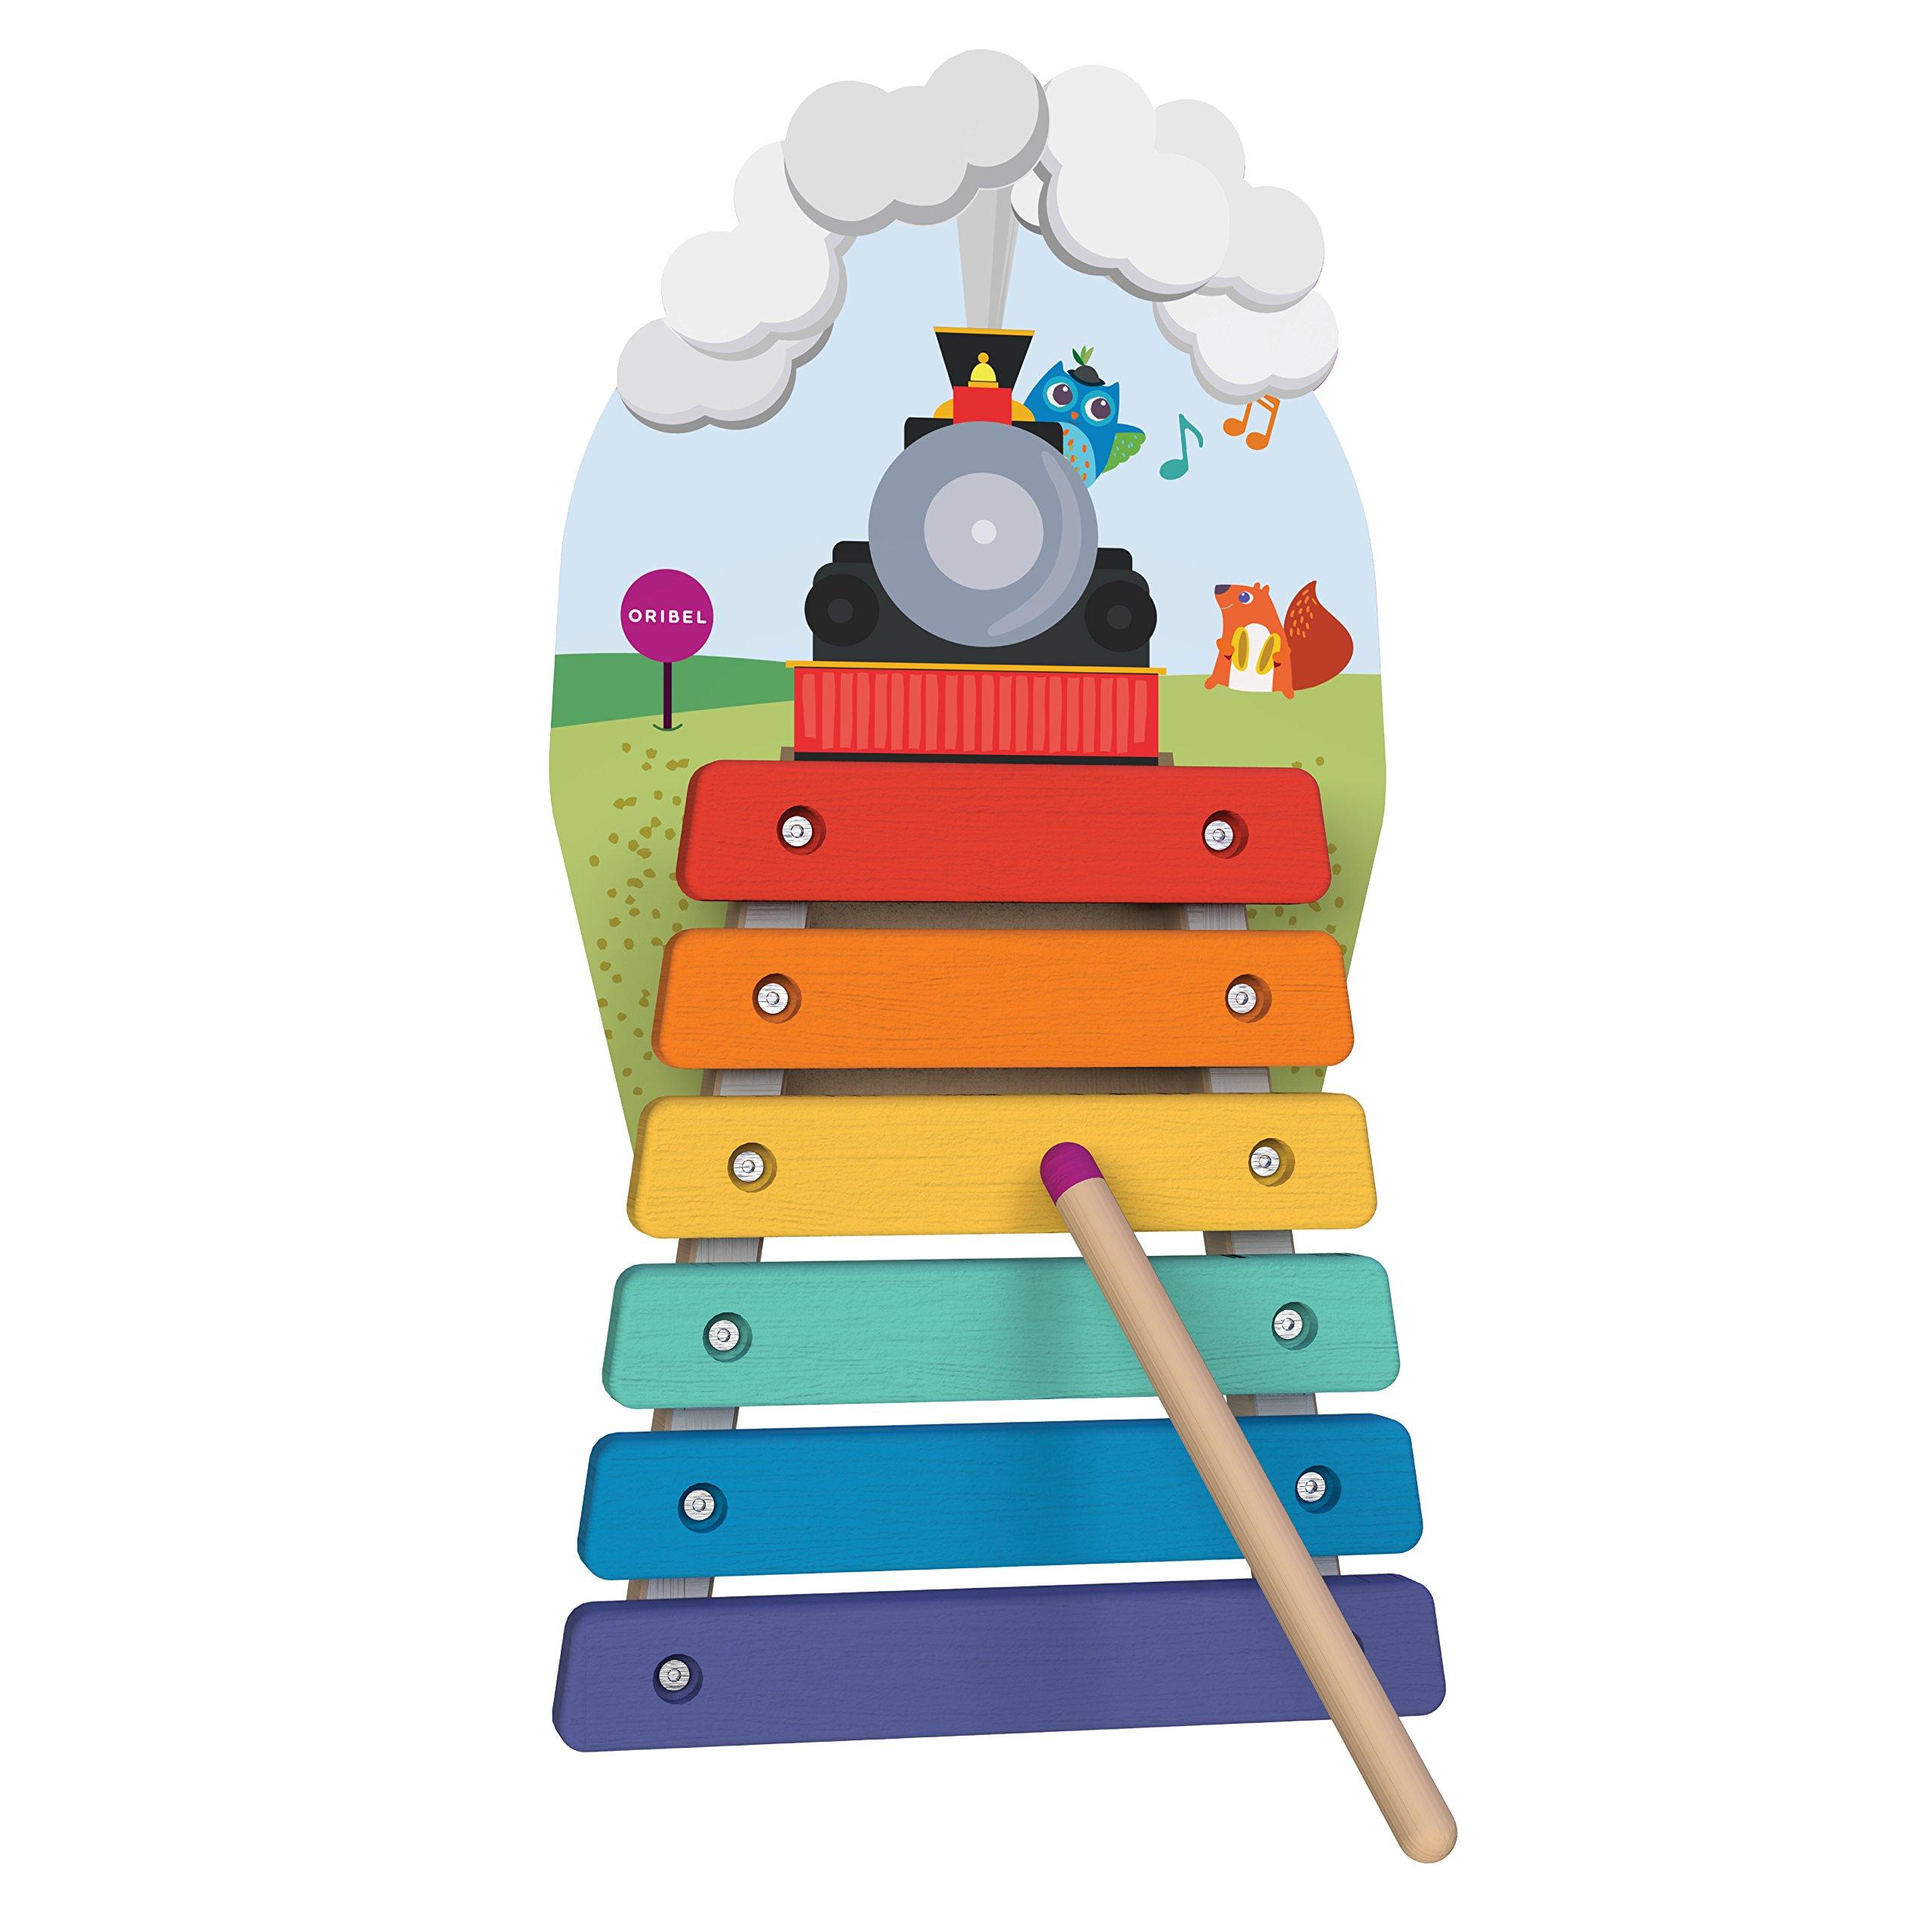 ORIBEL VertiPlay Wall Toys Play Wall Combo Set (Tree Top Adventure, Slidey Spidey, Woodpecker, Xylophone, Door Knocker) by ORIBEL (Image #6)